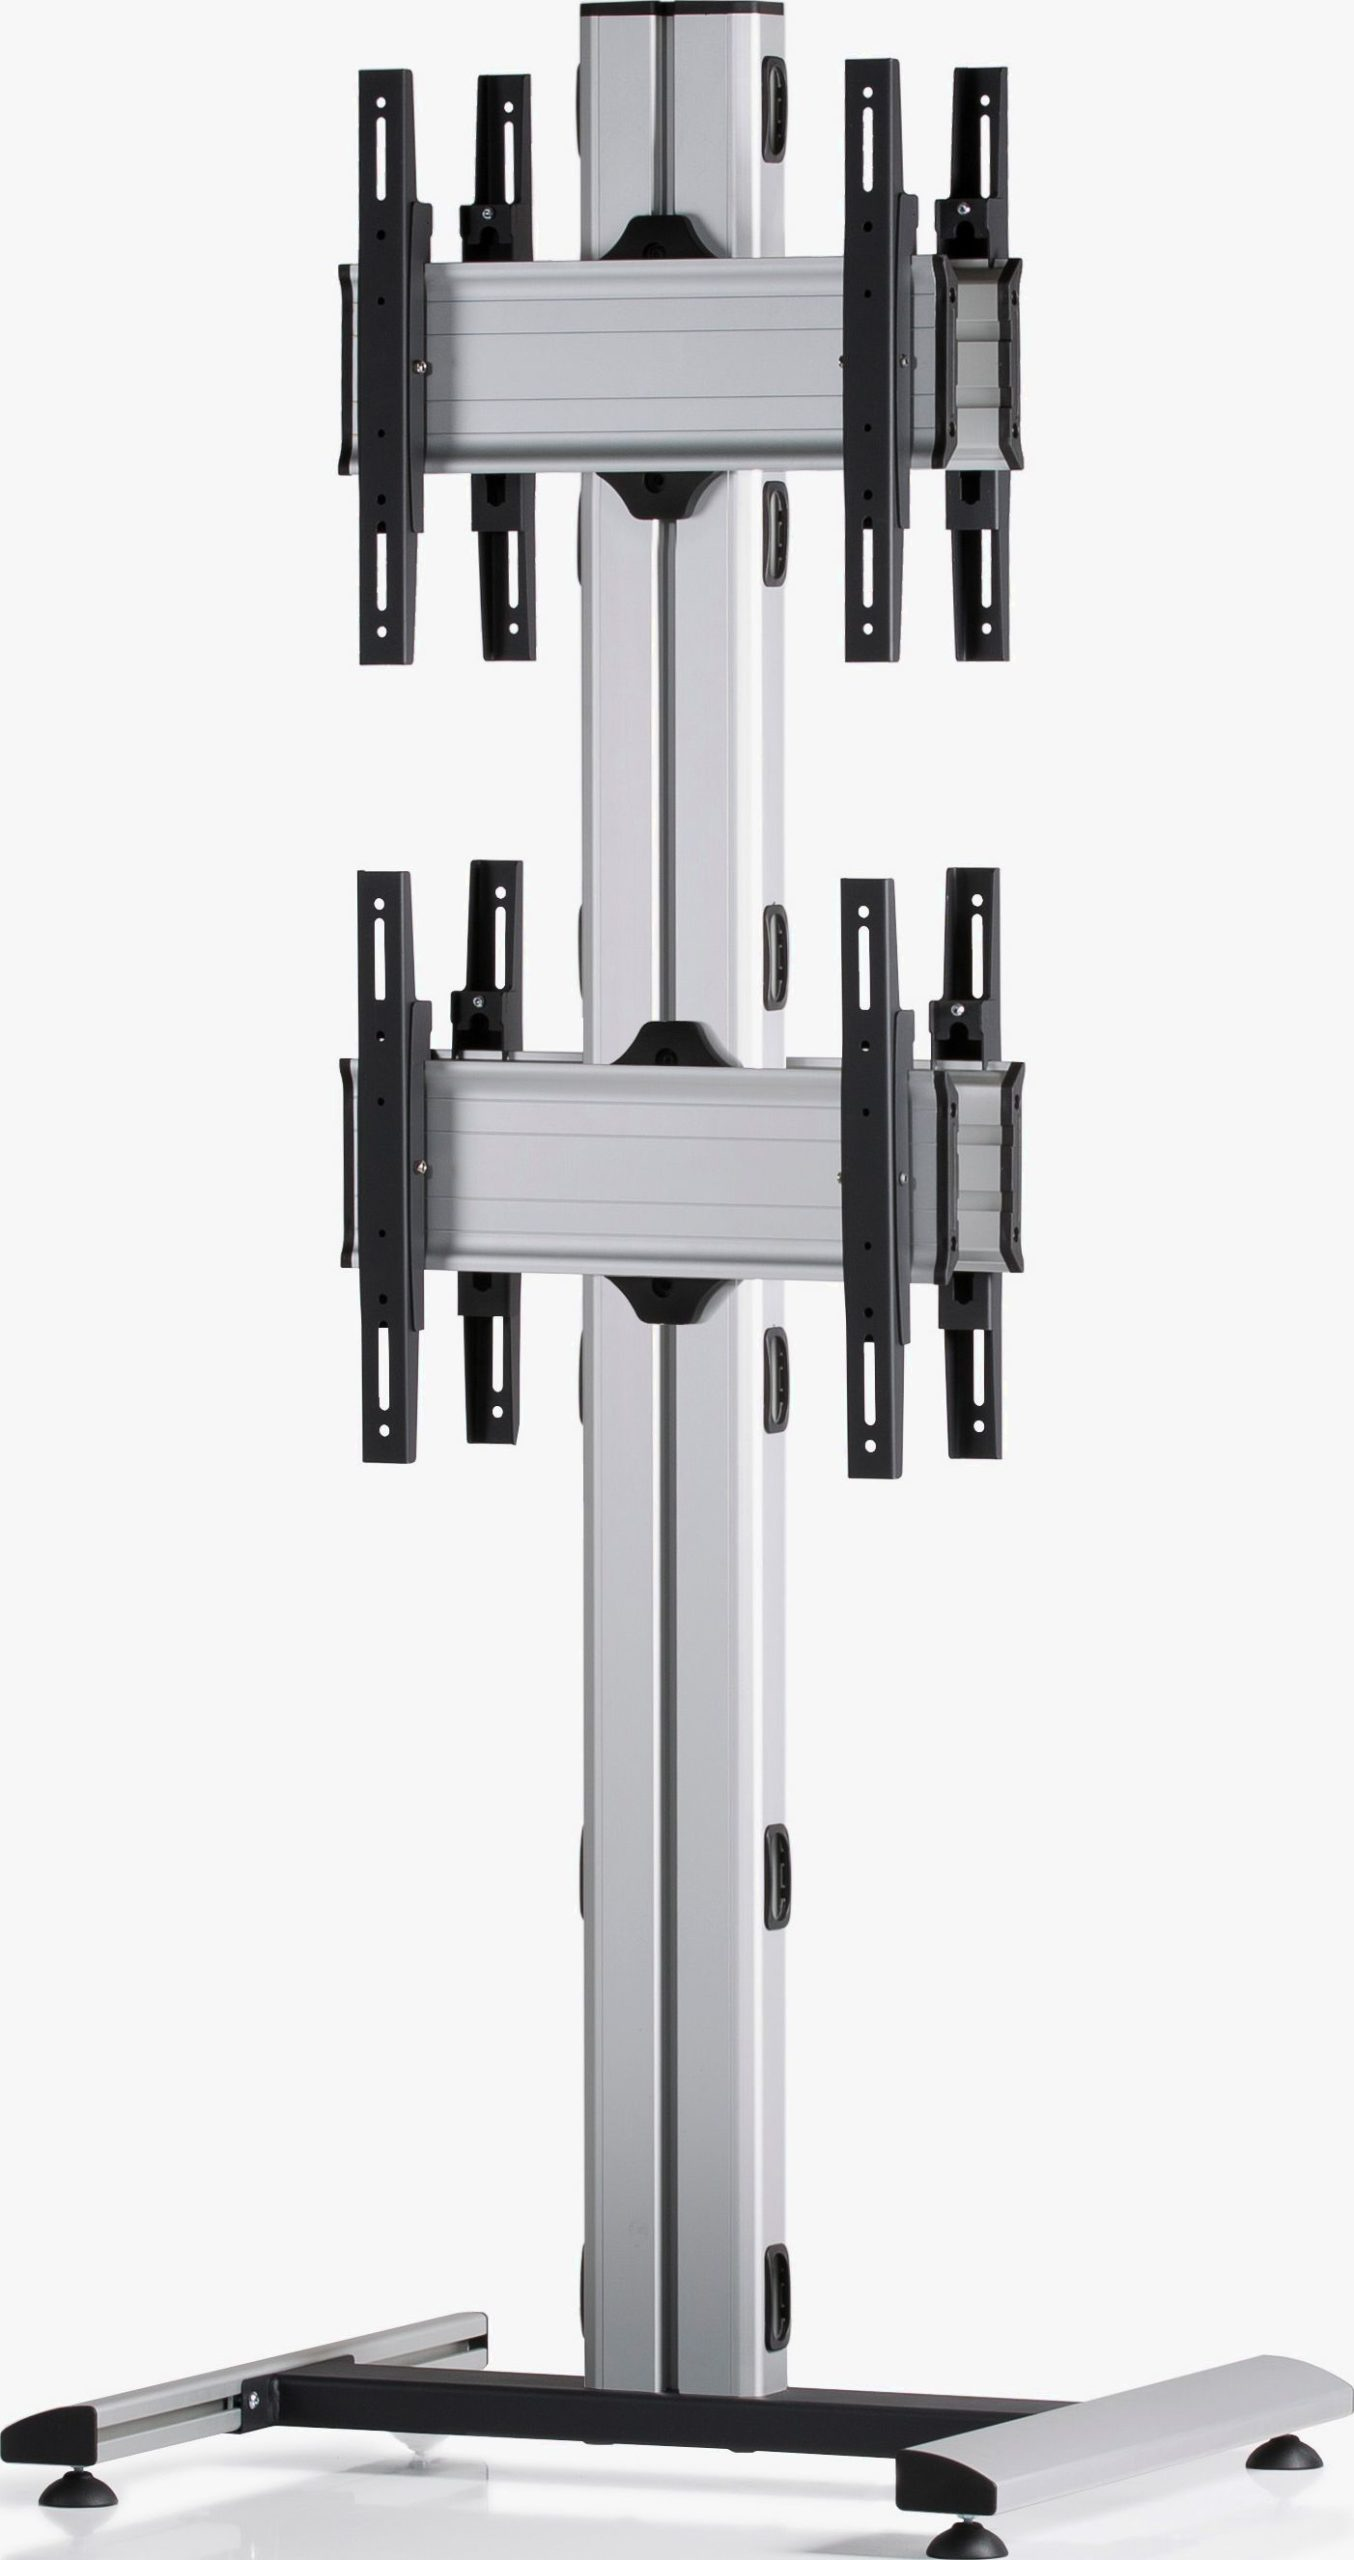 4 Displays 2x1 beidseitig, Standard-VESA, auf Standfuß